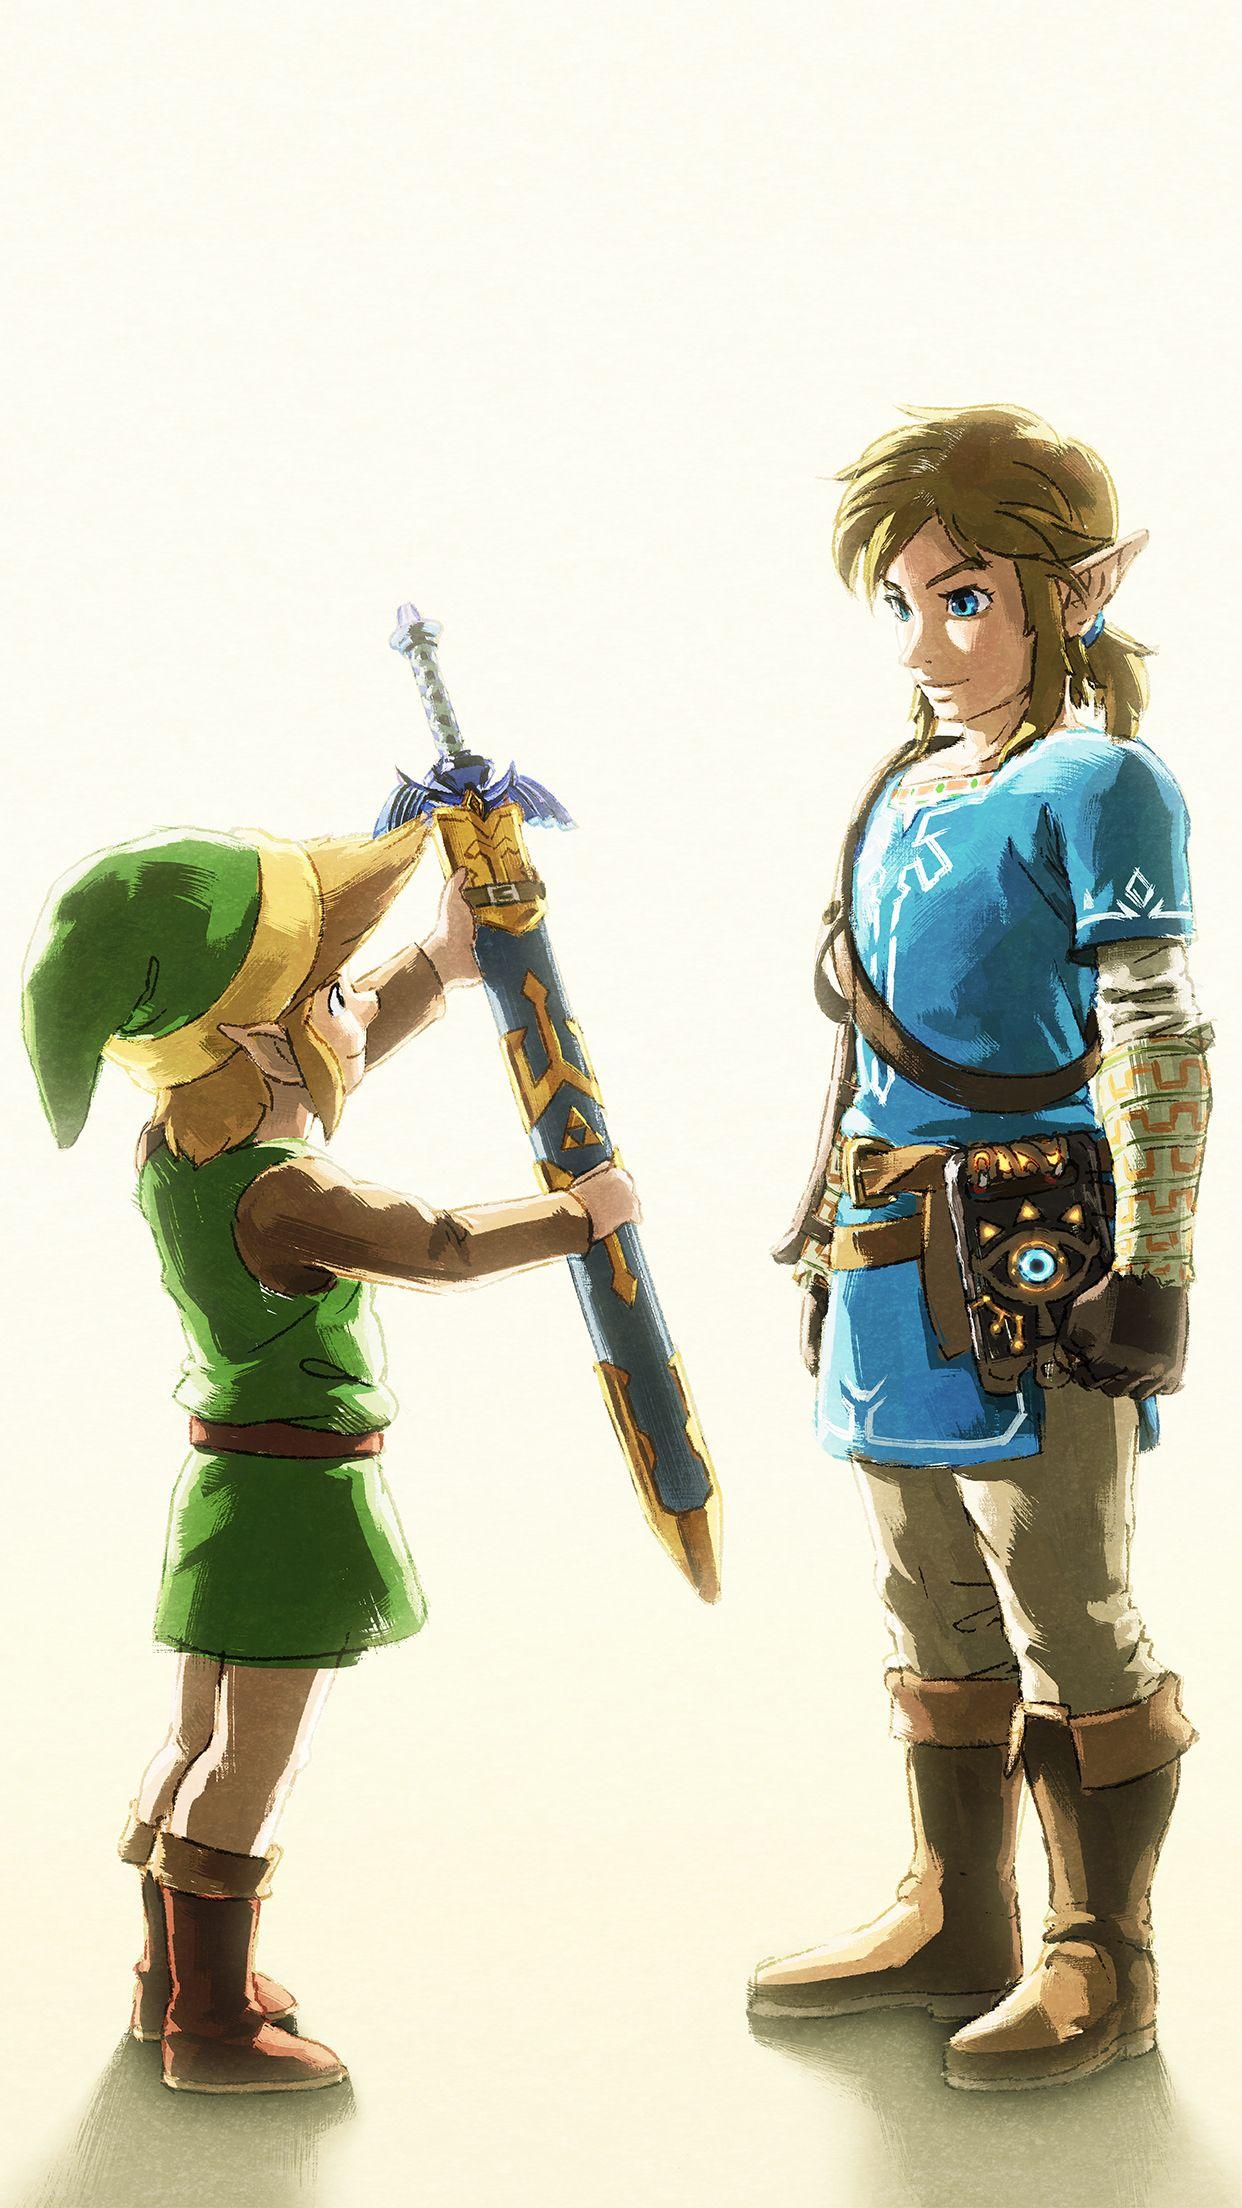 Pin By Distractedfox On The Legend Of Zelda Legend Of Zelda Legend Of Zelda Breath Breath Of The Wild